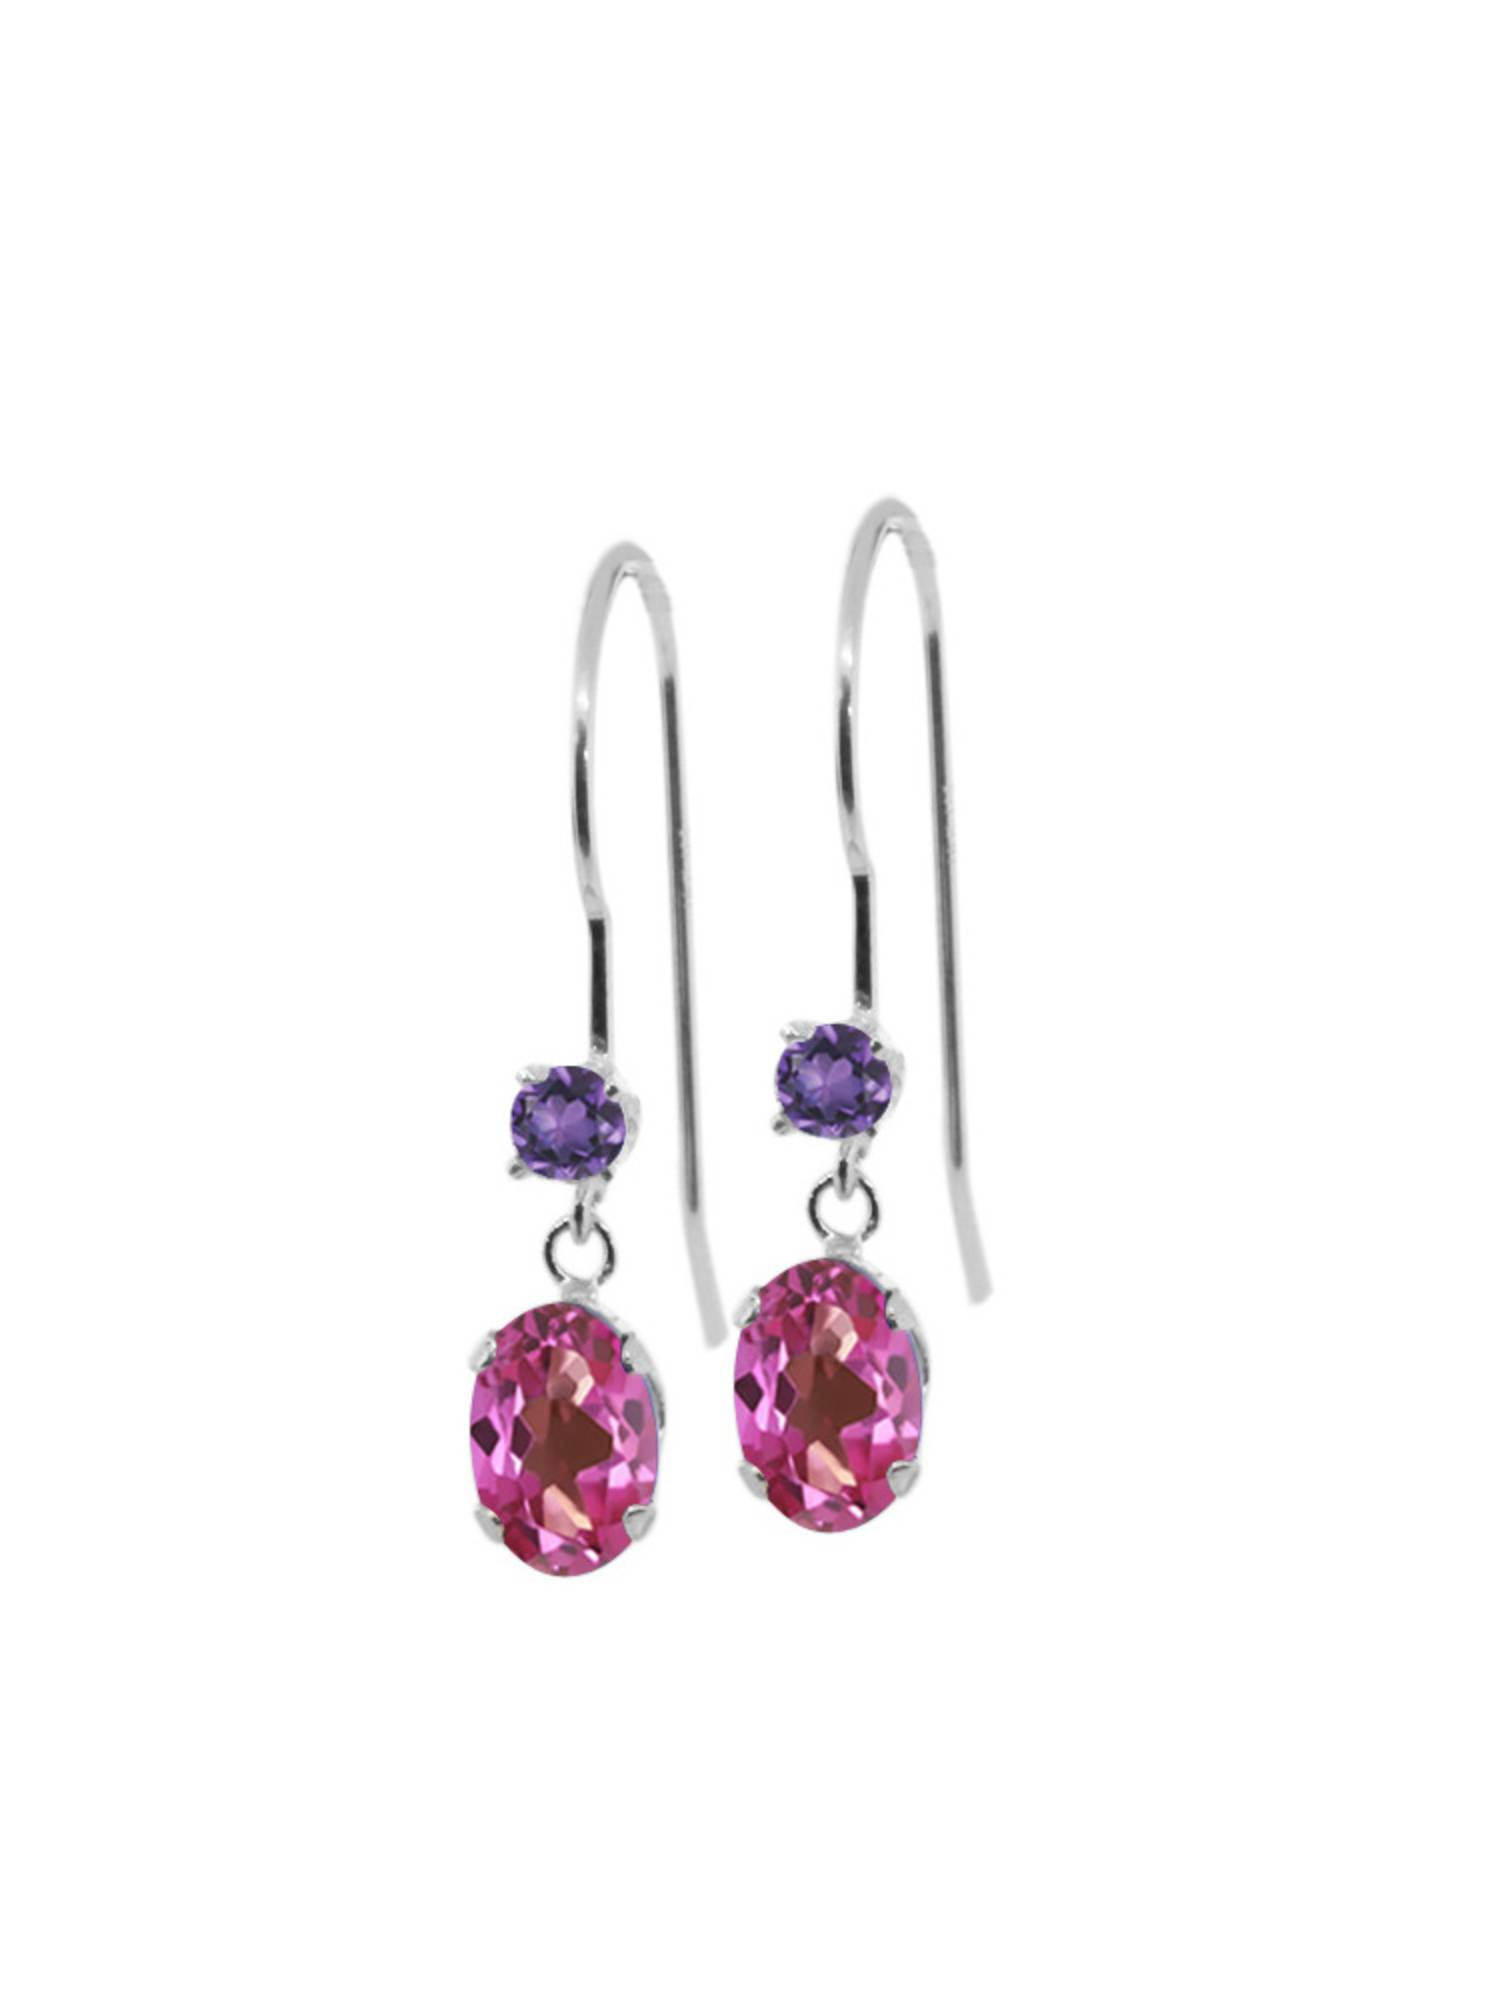 1.22 Ct Oval Pink Mystic Topaz Purple Amethyst 14K White Gold Earrings by